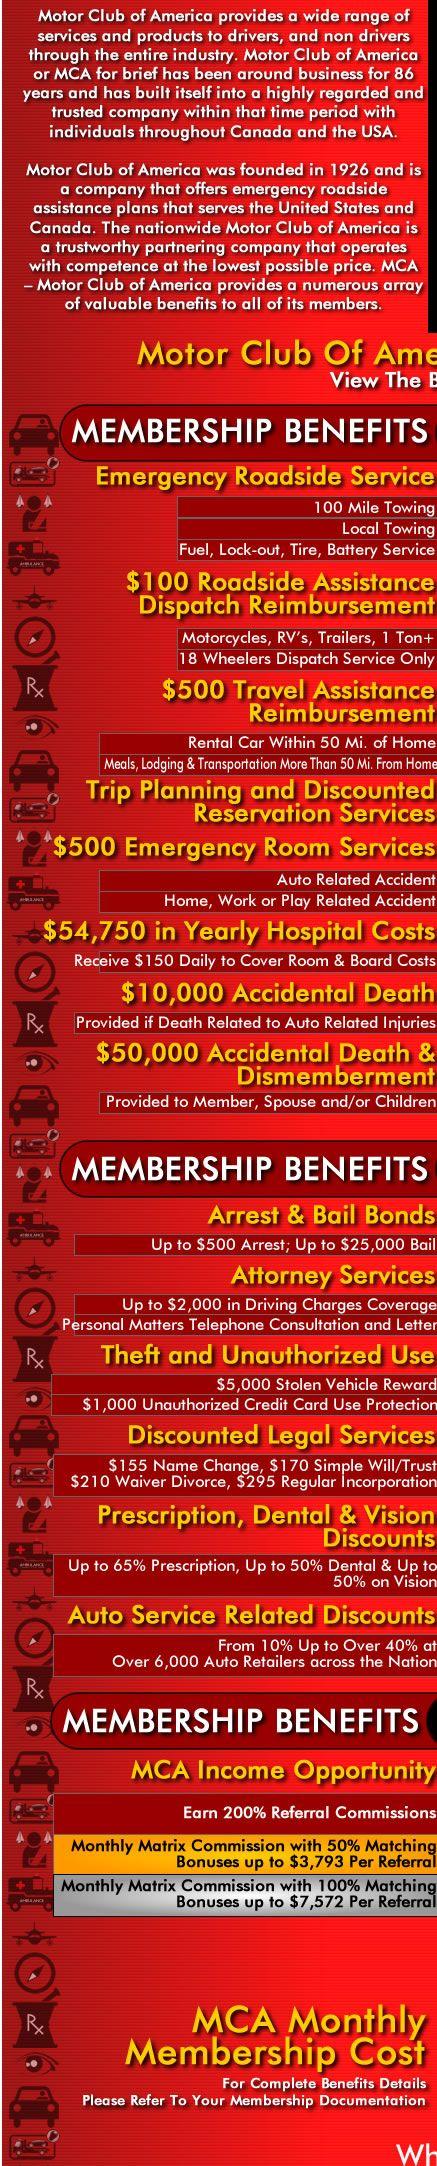 Motor Club of America - Benefits Presentation http://bestroadsideassistance.ga